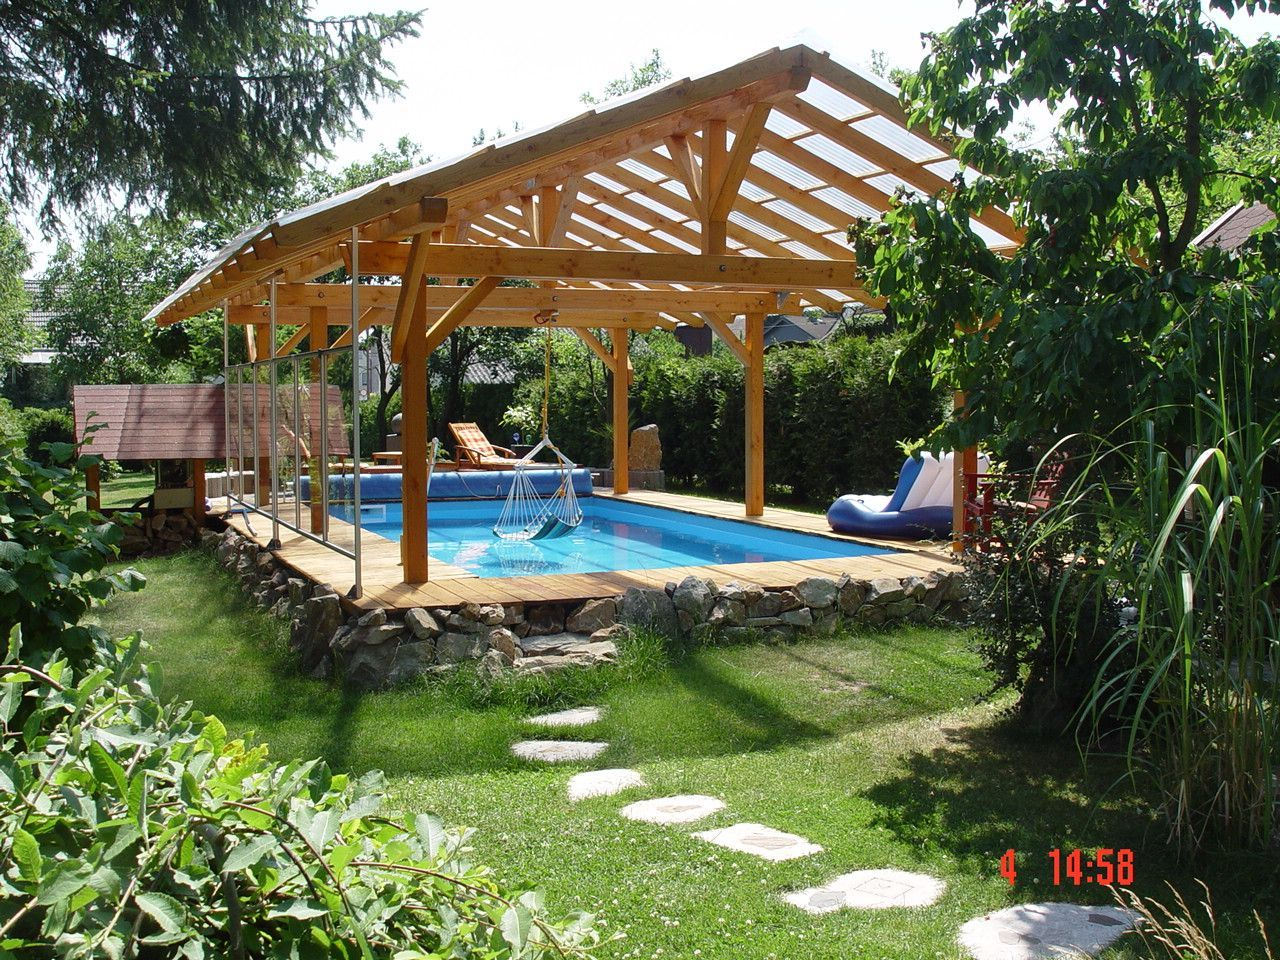 Pool Mauern Das Resultat Poolselberbauen In 2020 Pool Canopy Backyard Pool Designs Backyard Pool